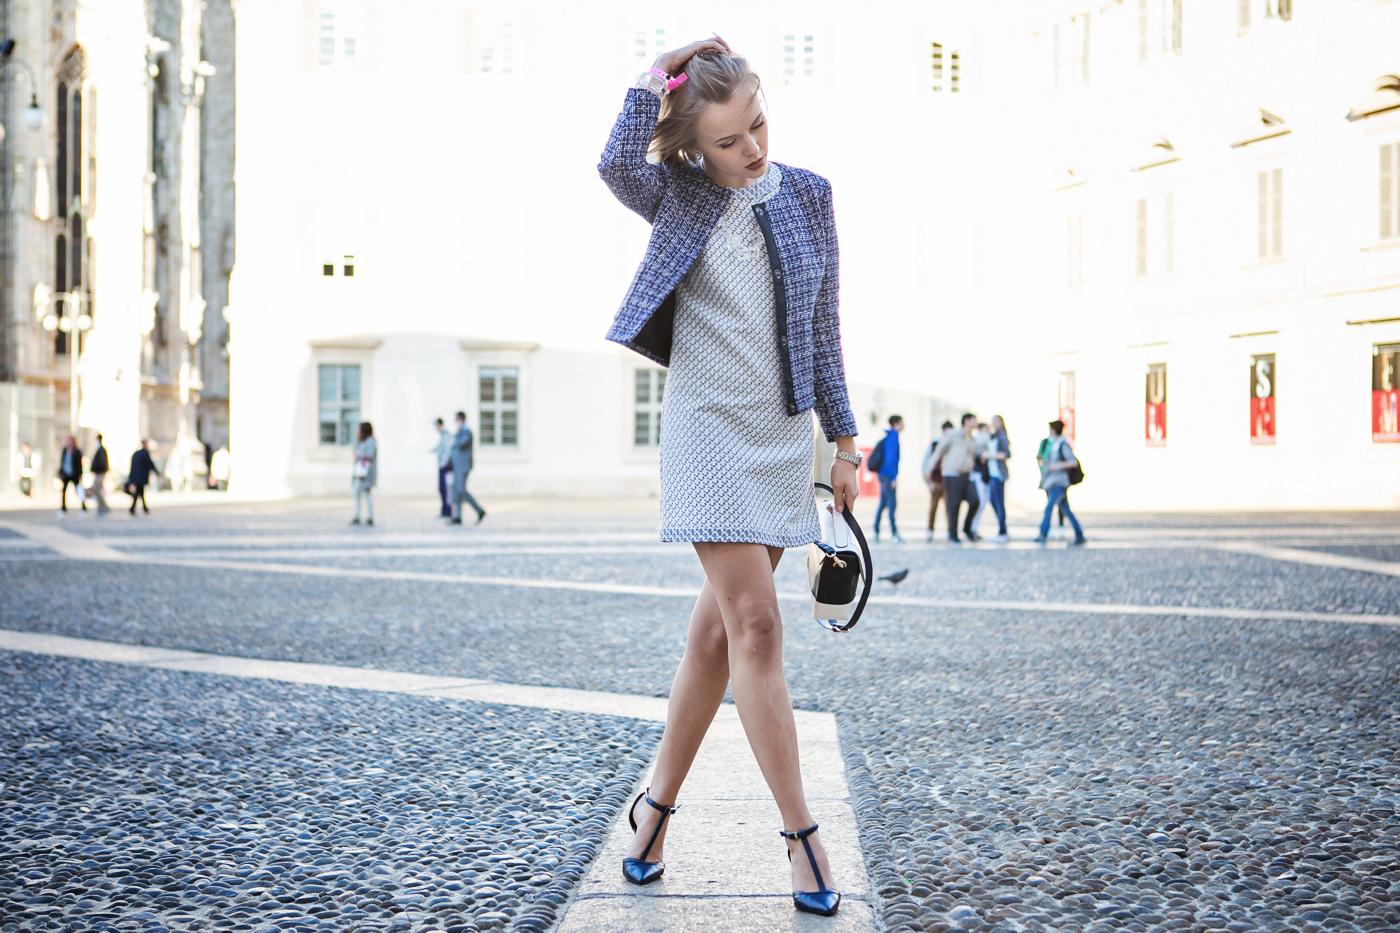 darya kamalova thecablook russian italian fashion bogger street style trend BENETTON TOTAL LOOK benettonconceptstoreanouska proetta brandon piazza duomo milan party valentina soster new collection aw 14 15_-66